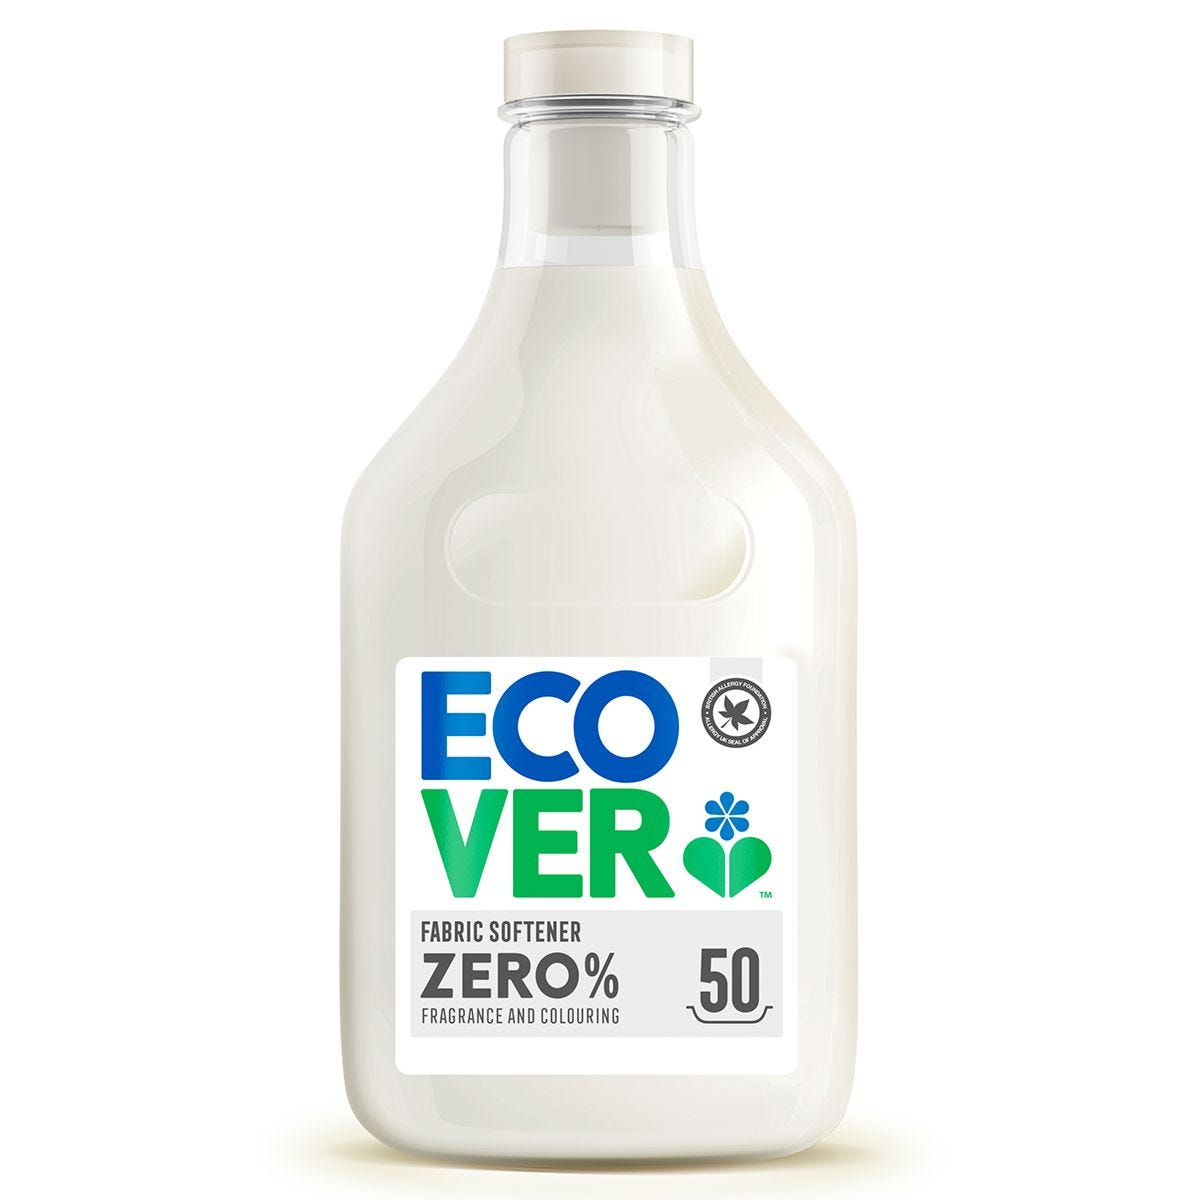 Ecover Zero Fabric Softener - 1.5L